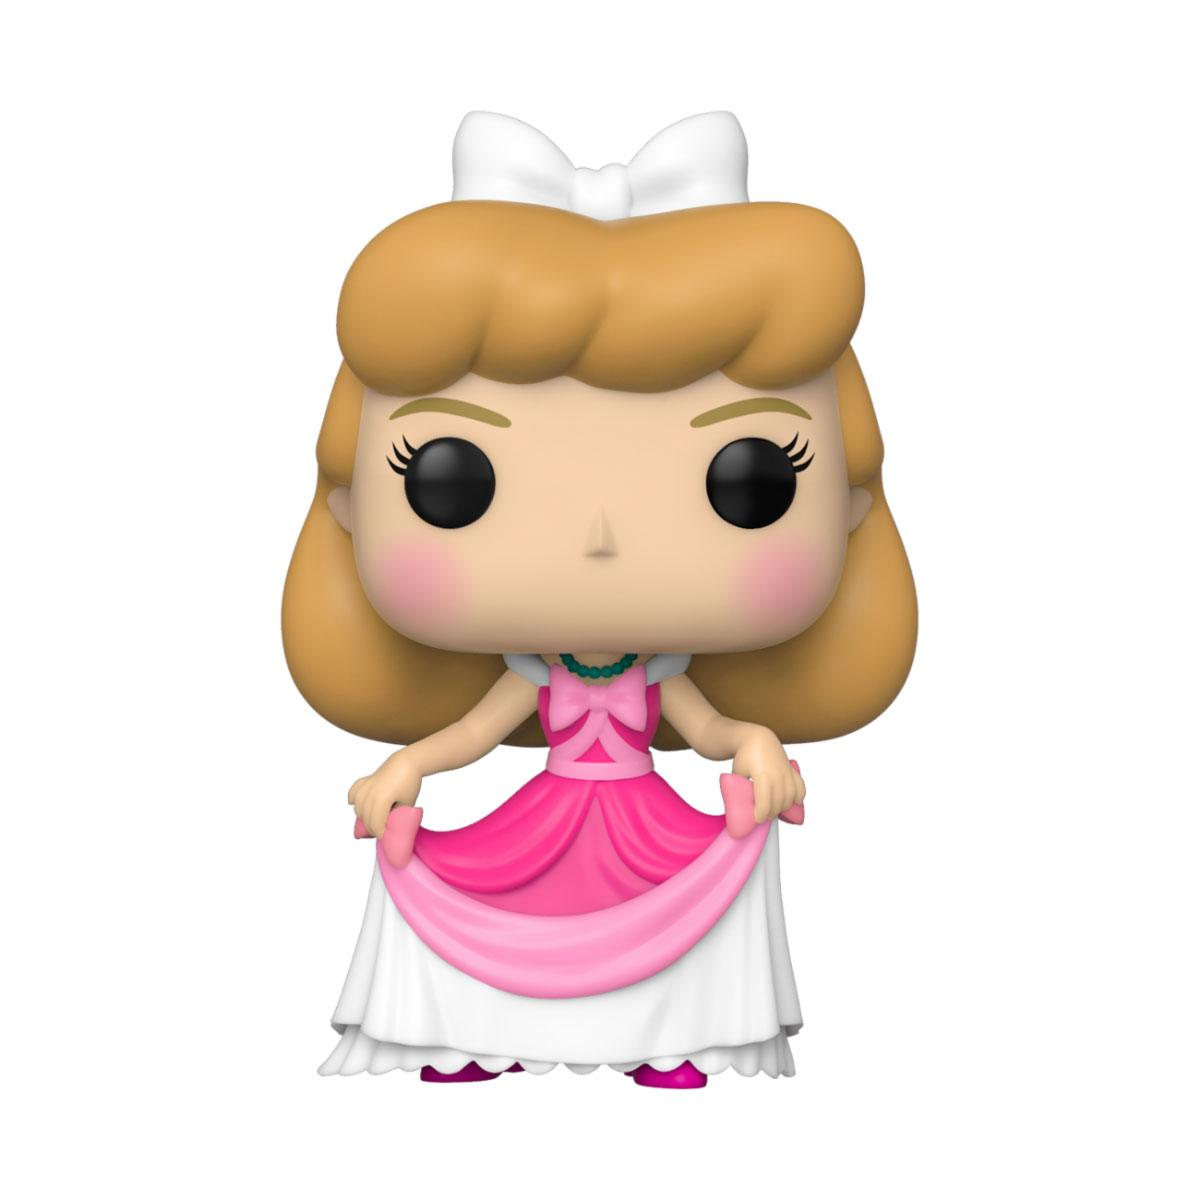 Cendrillon POP! Vinyl Figurine Cendrillon (Pink Dress) 9 cm